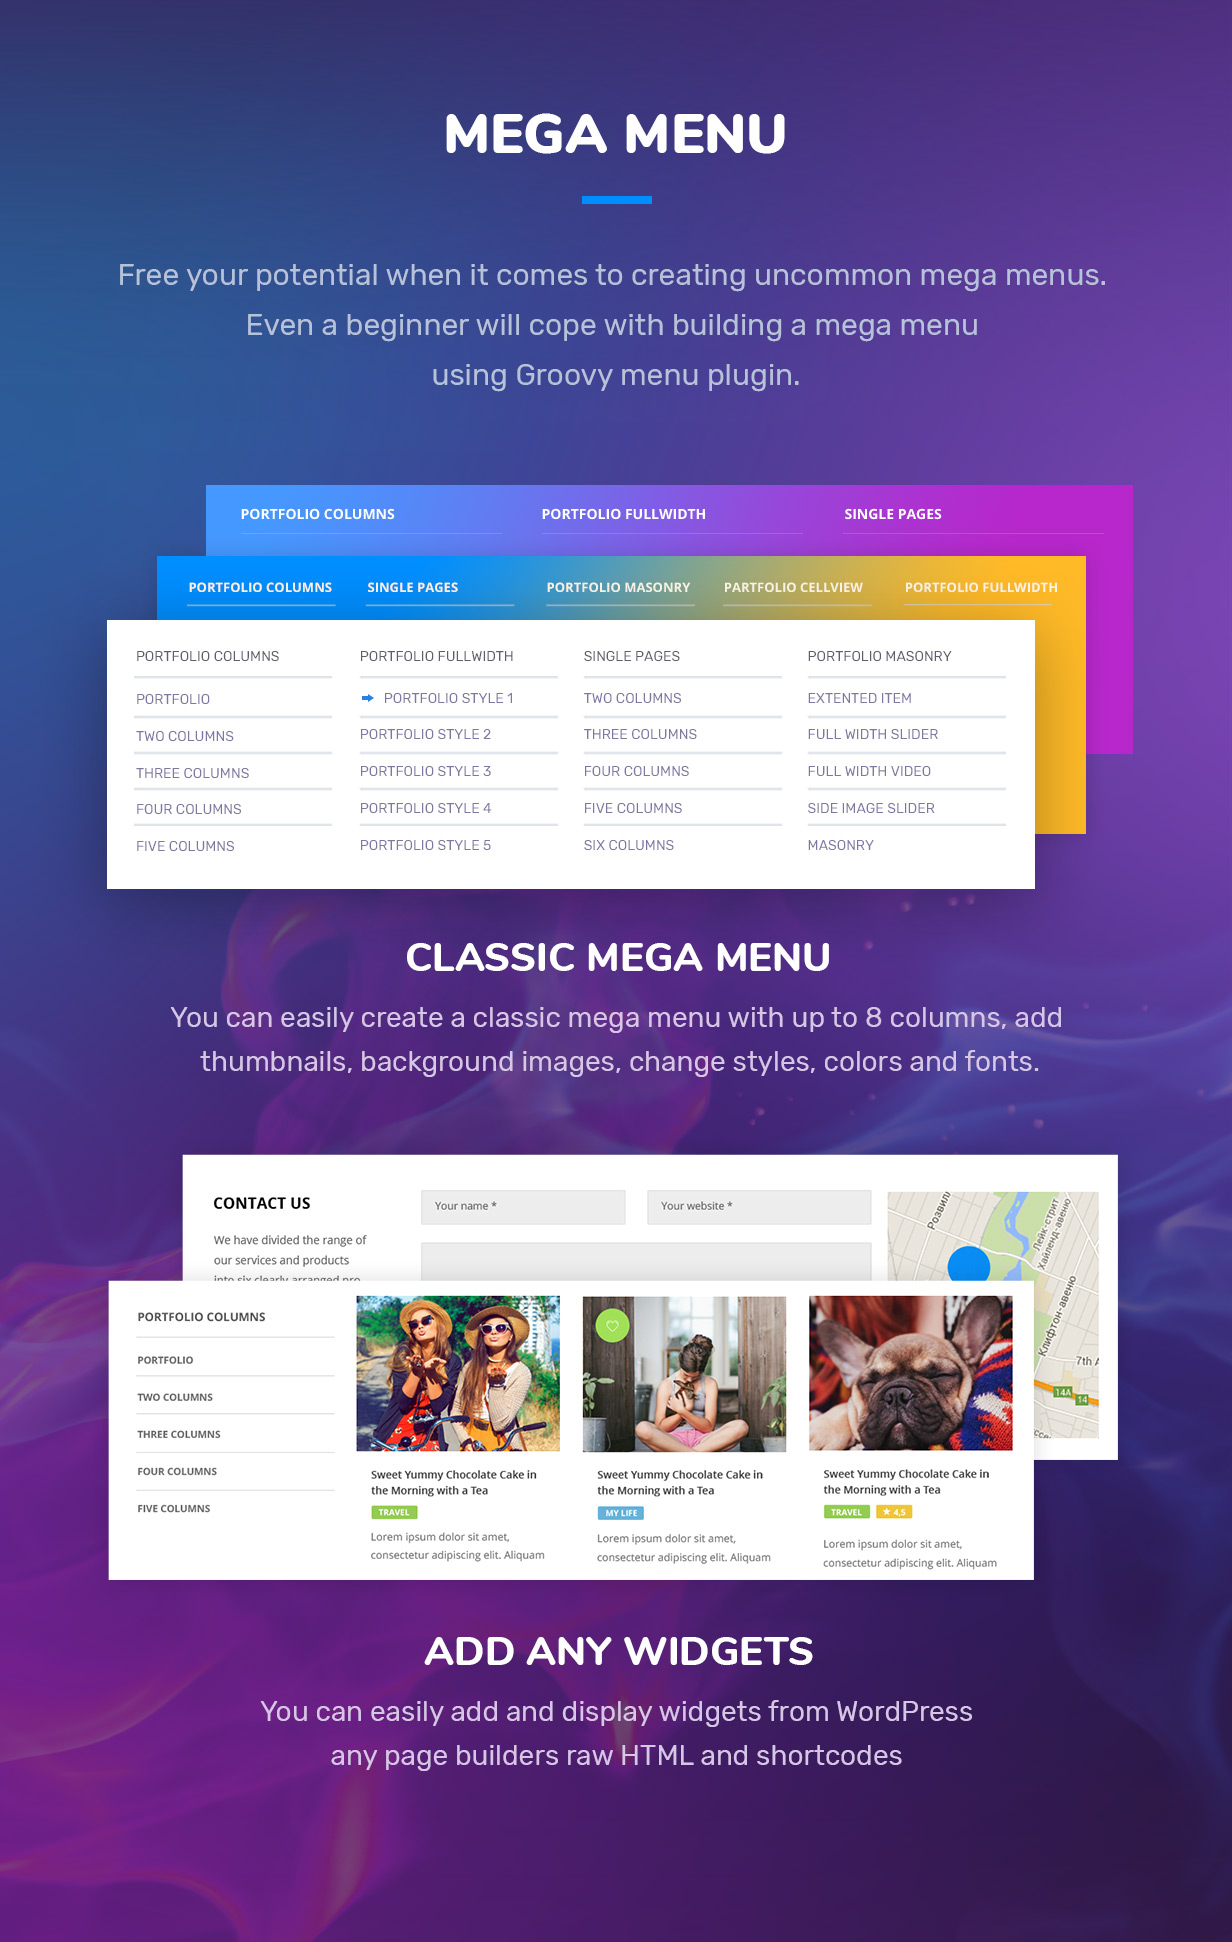 Groovy Mega Menu-WordPress大型超级菜单插件[更至v2.4.8]插图12